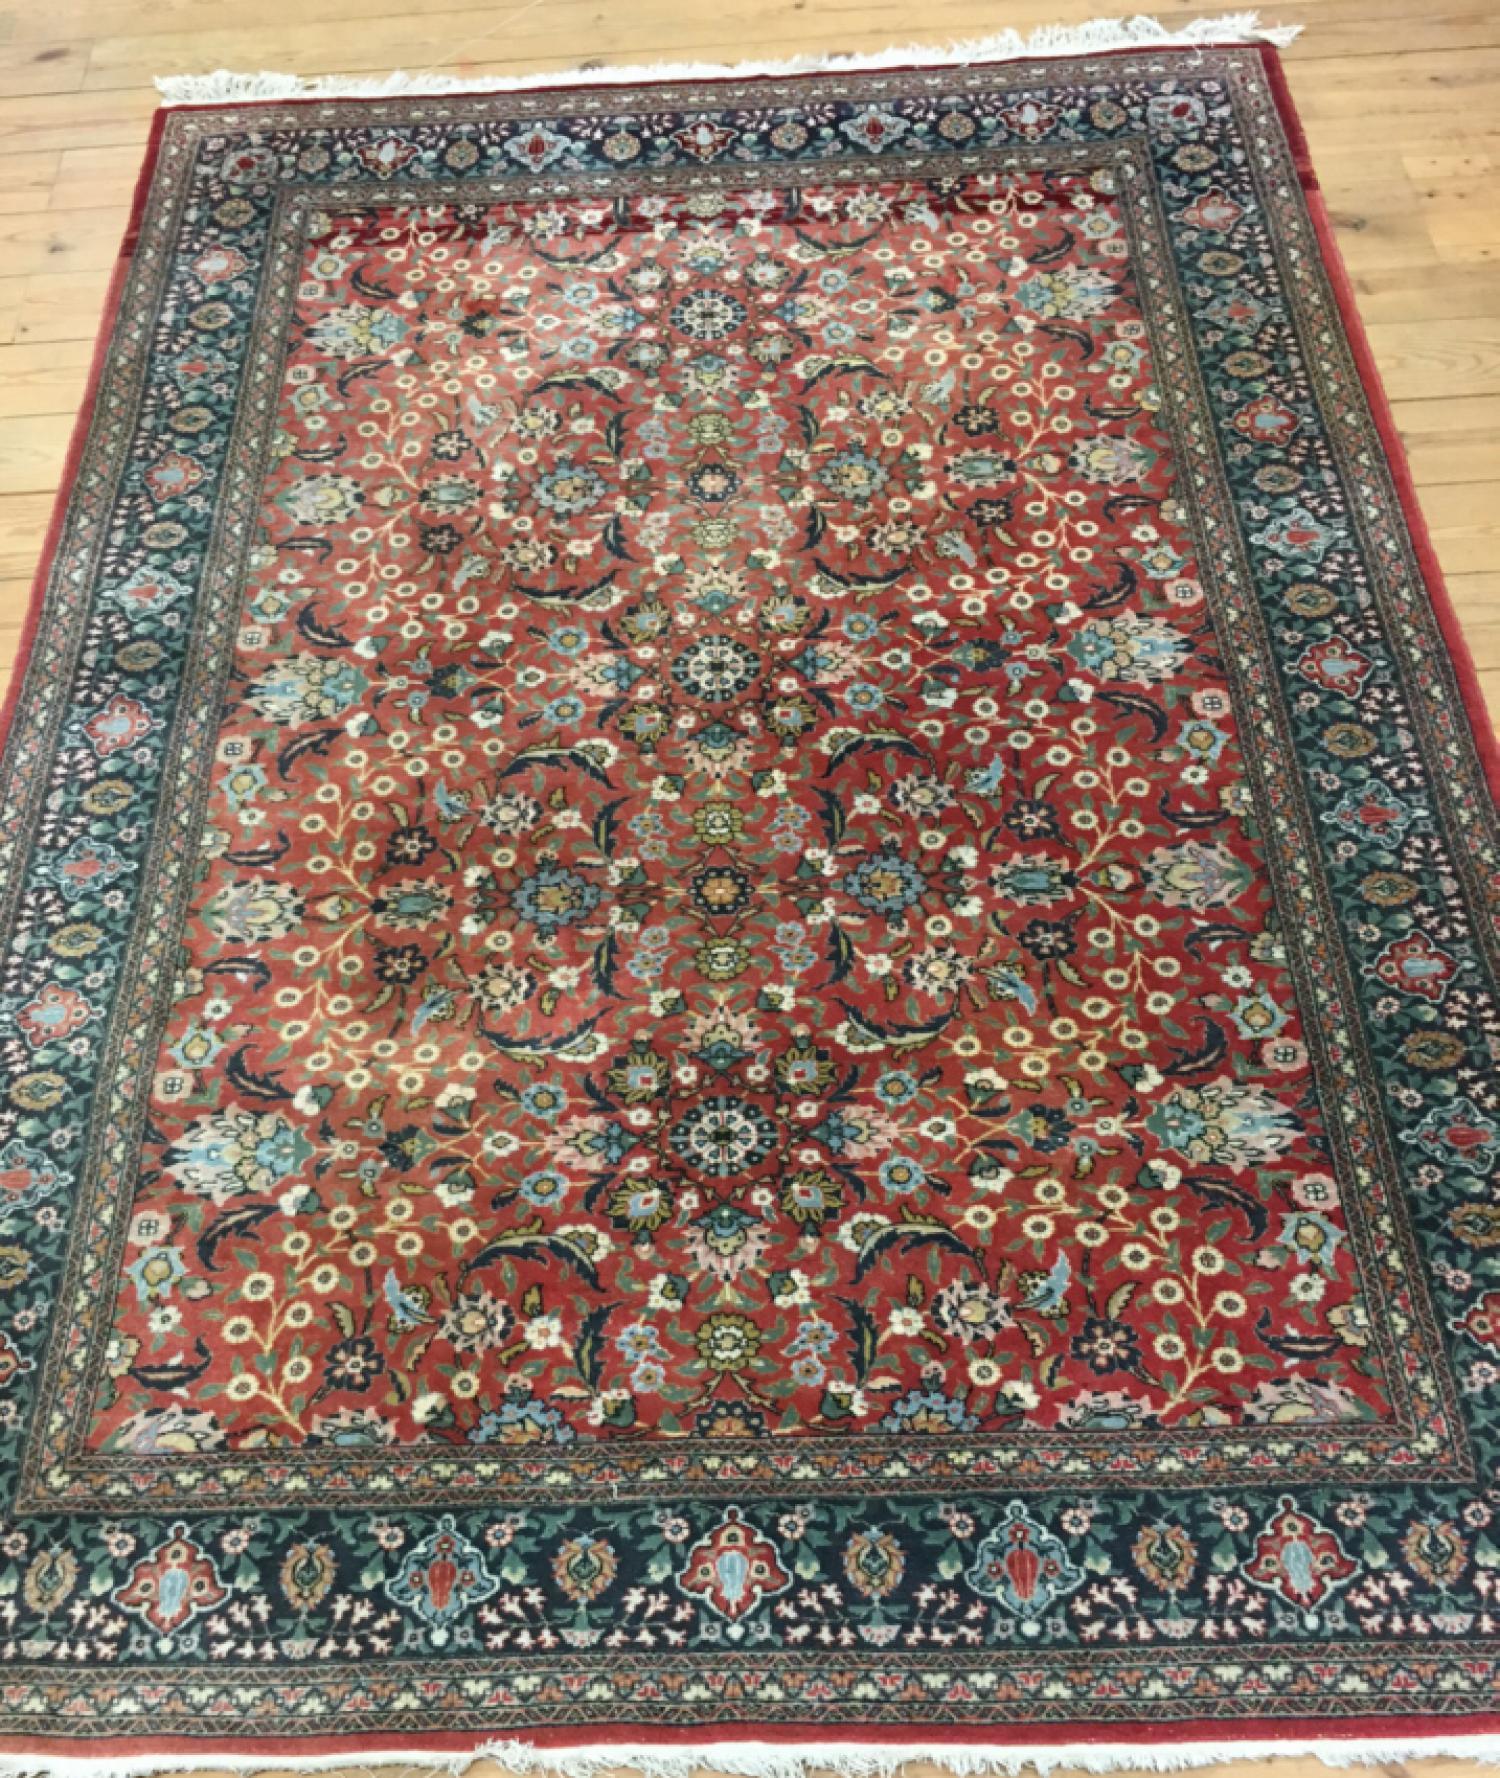 Vintage Persian Sarouk style oriental rug c1950